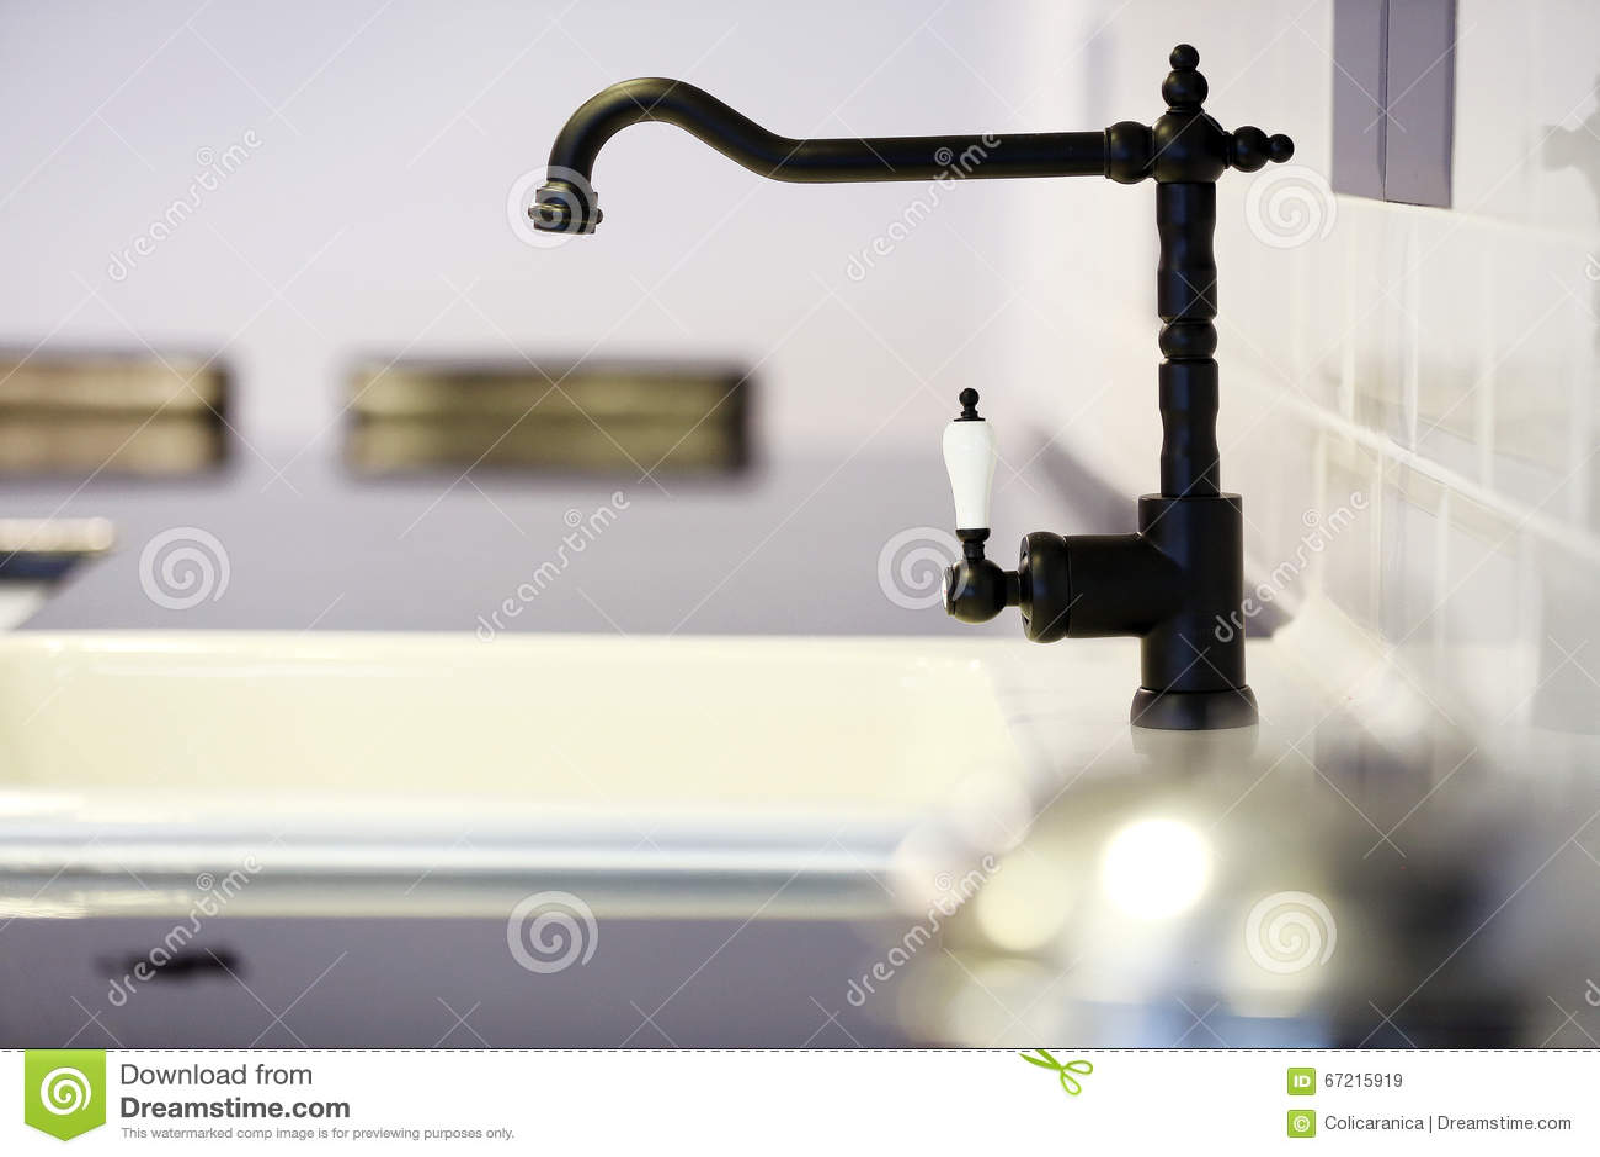 black faucet kitchen american cabinets 黑色龙头库存图片 图片包括有表面无光泽 关闭 投反对票 详细资料 黑现代龙头在厨房里 特写镜头视图